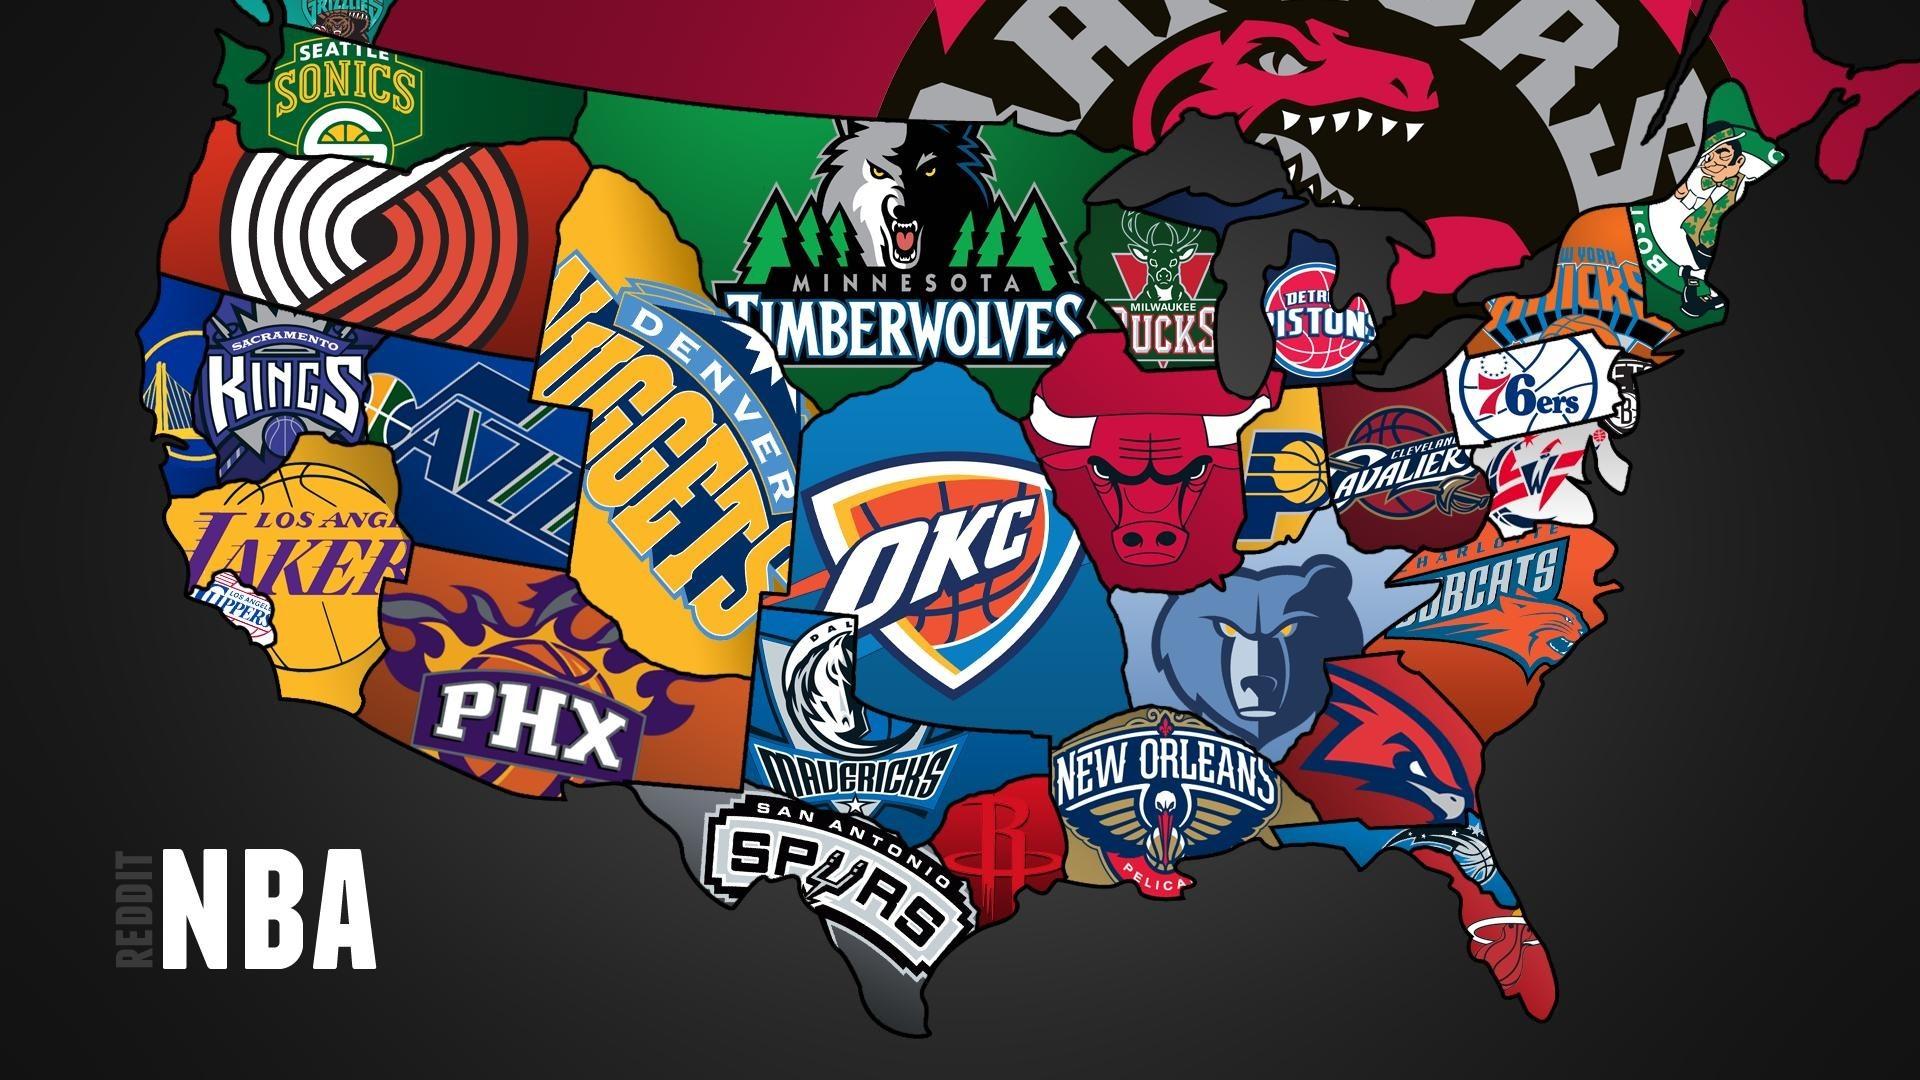 NBA, Sports, Stars, Basketball